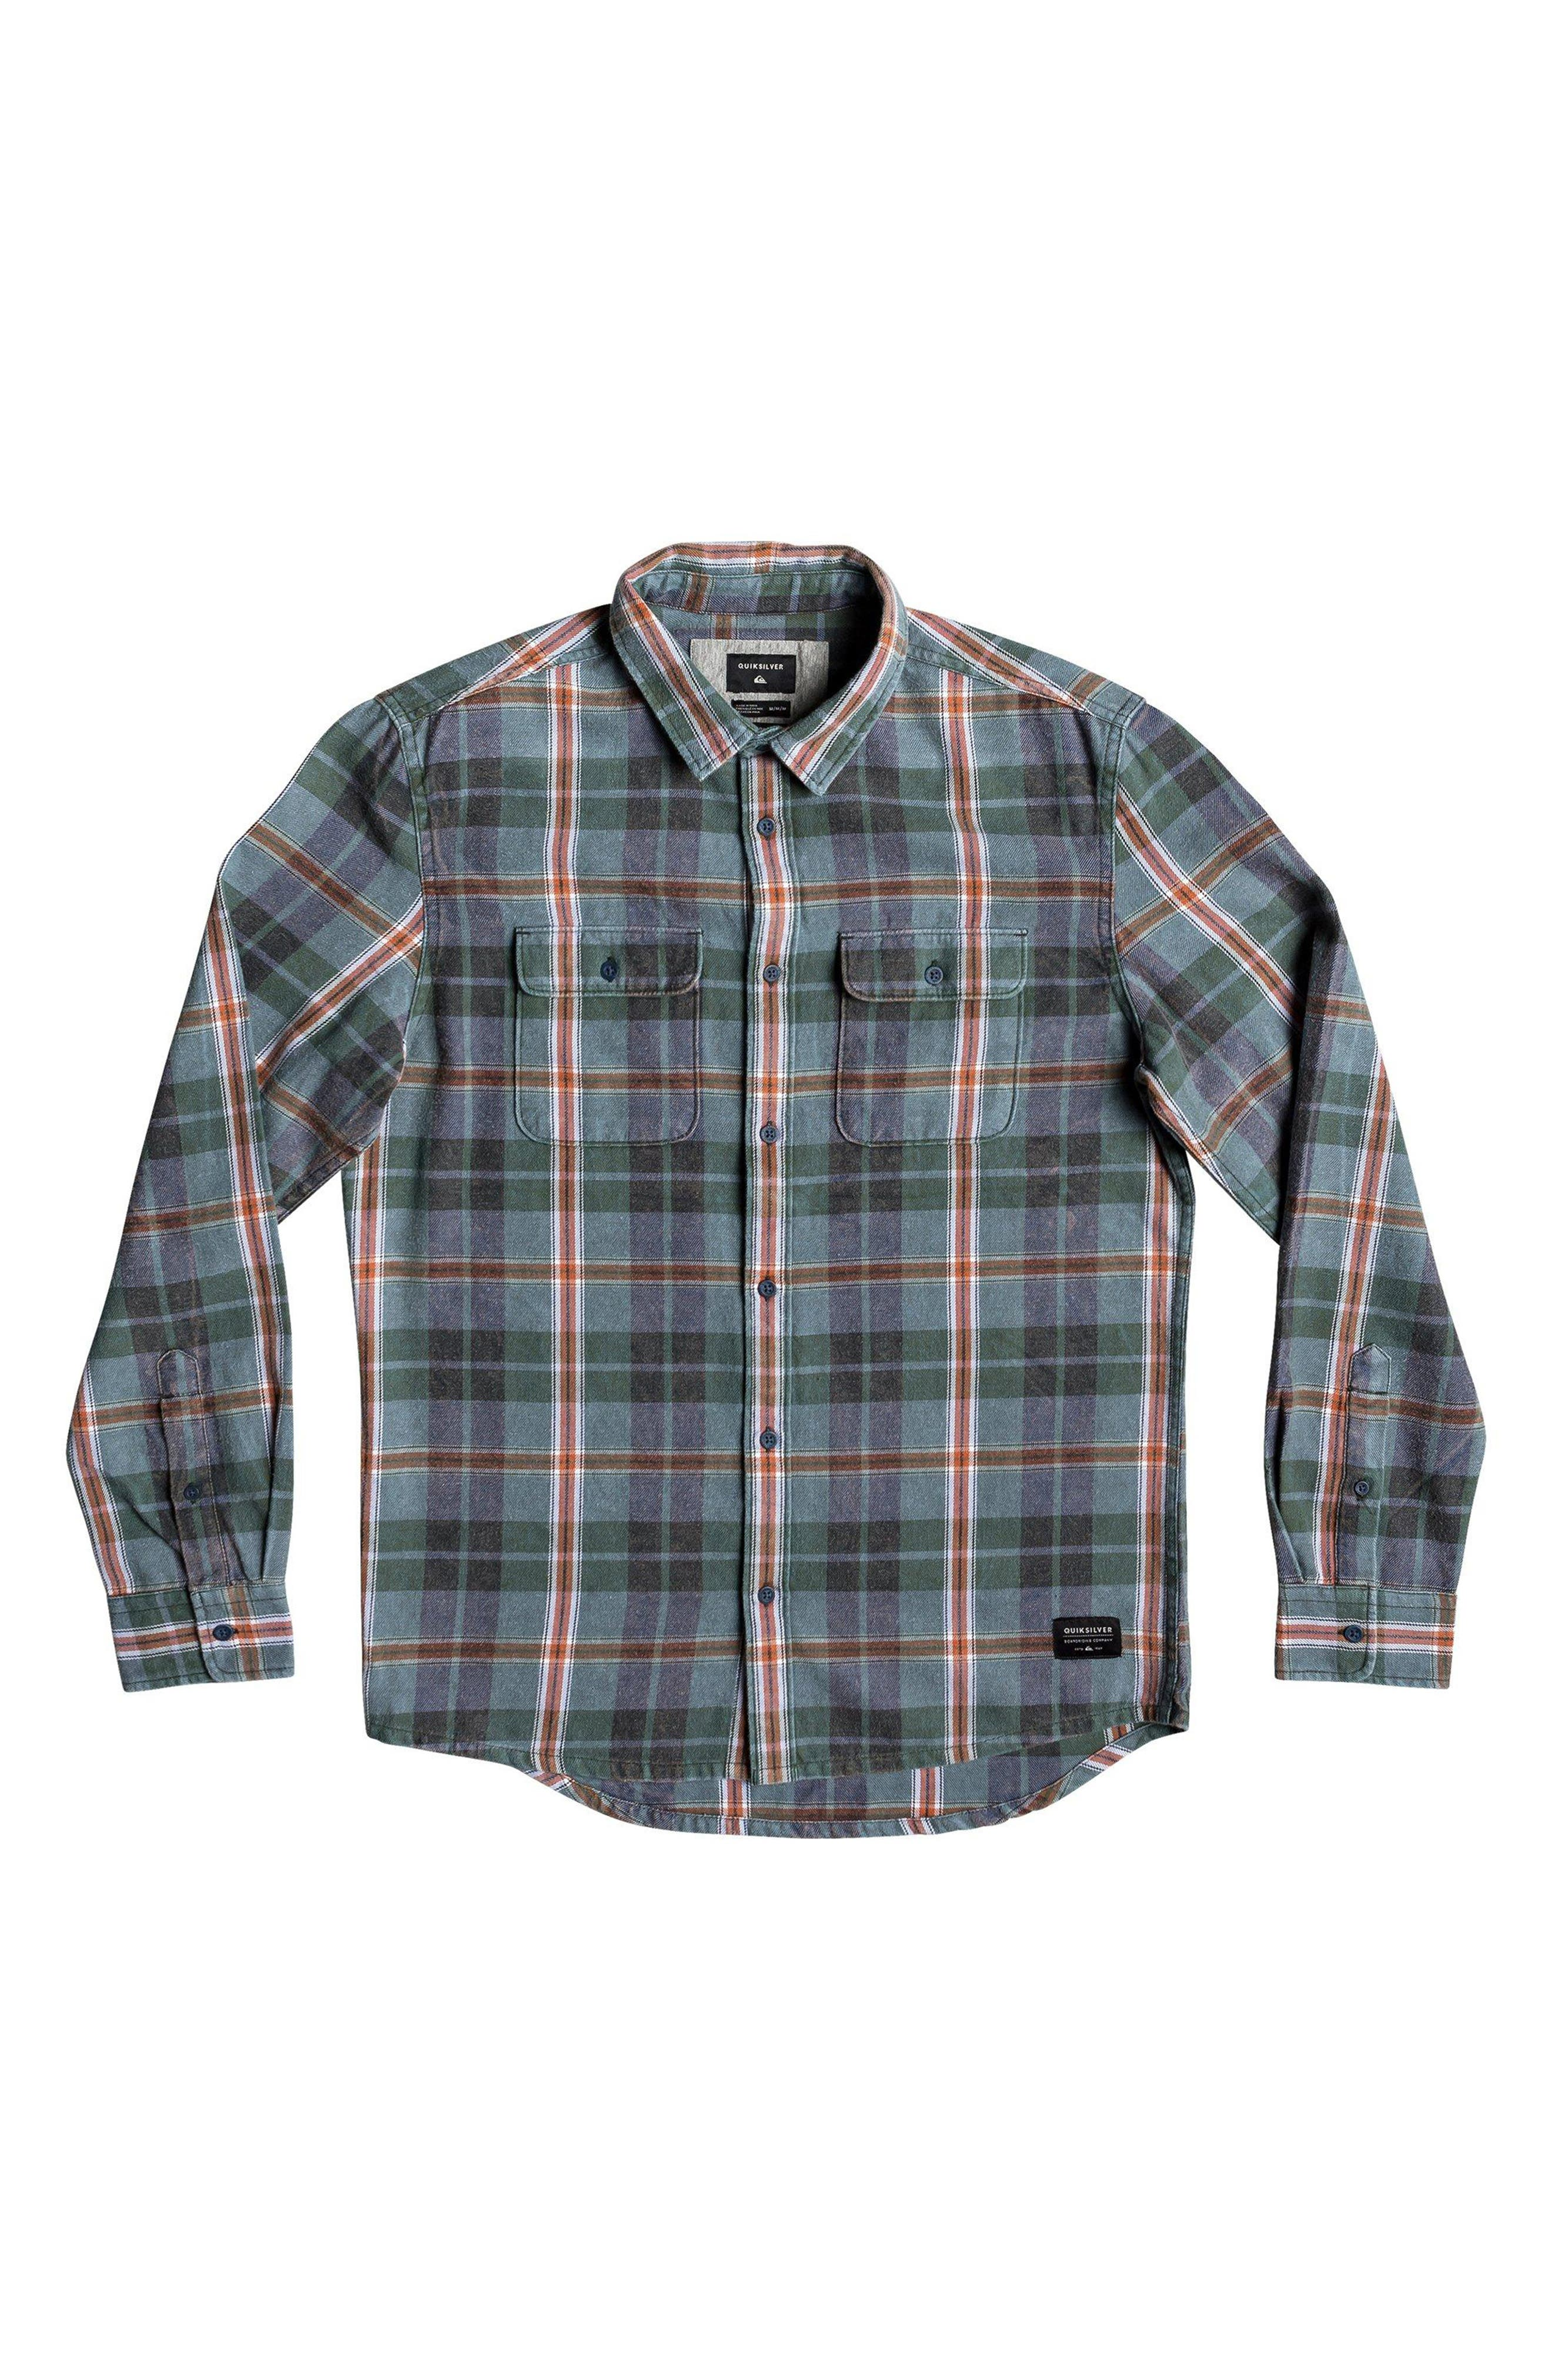 Super Tang Flannel Shirt,                             Alternate thumbnail 4, color,                             STONE WASH TANG